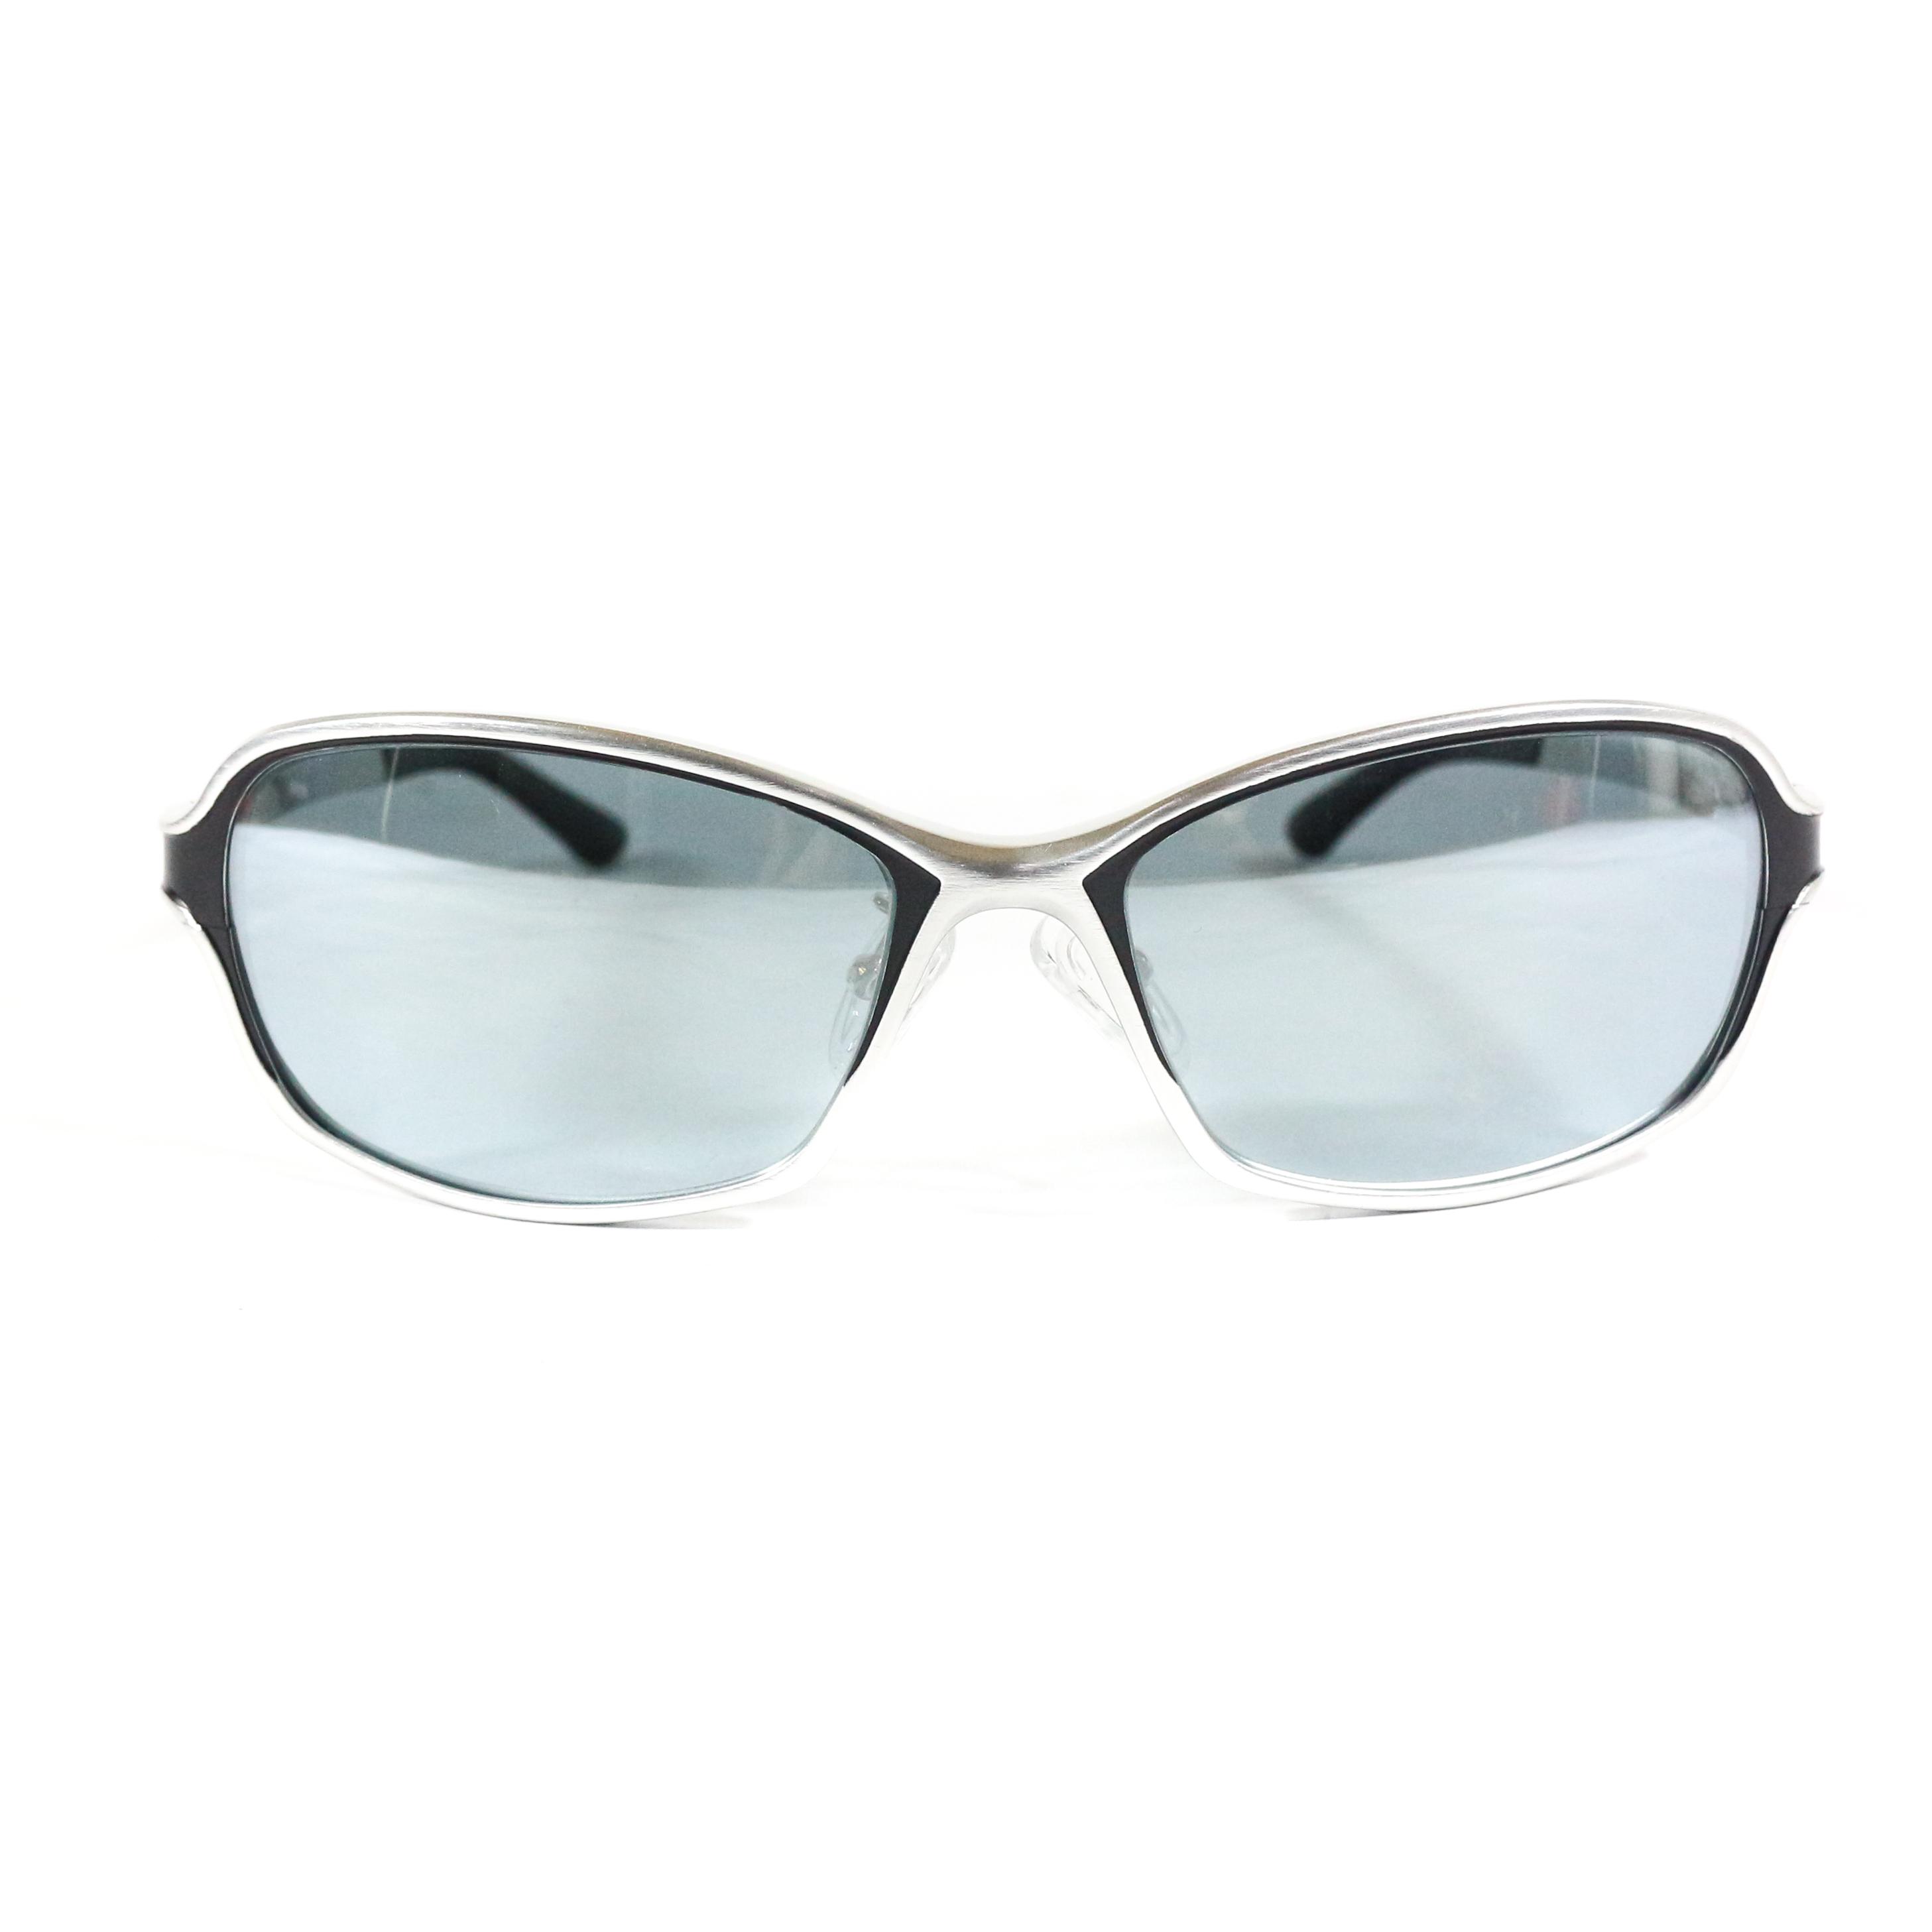 Zeal Polarised Fishing Sunglasses Dorio F-1661 SILVER MIRROR BLUE (6788)